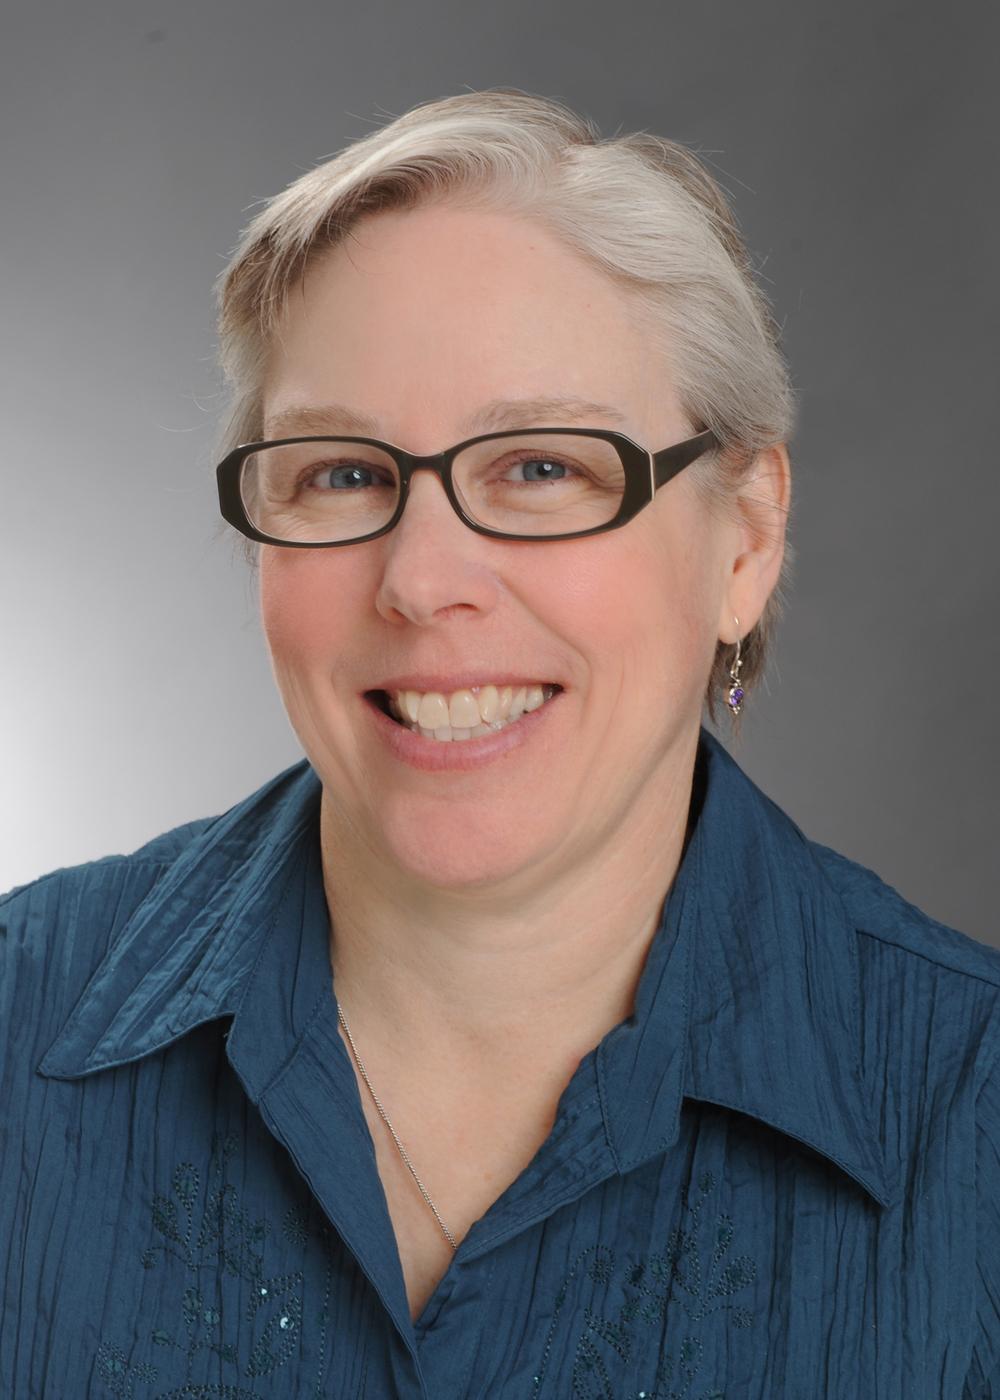 Beth A Haller, PhD